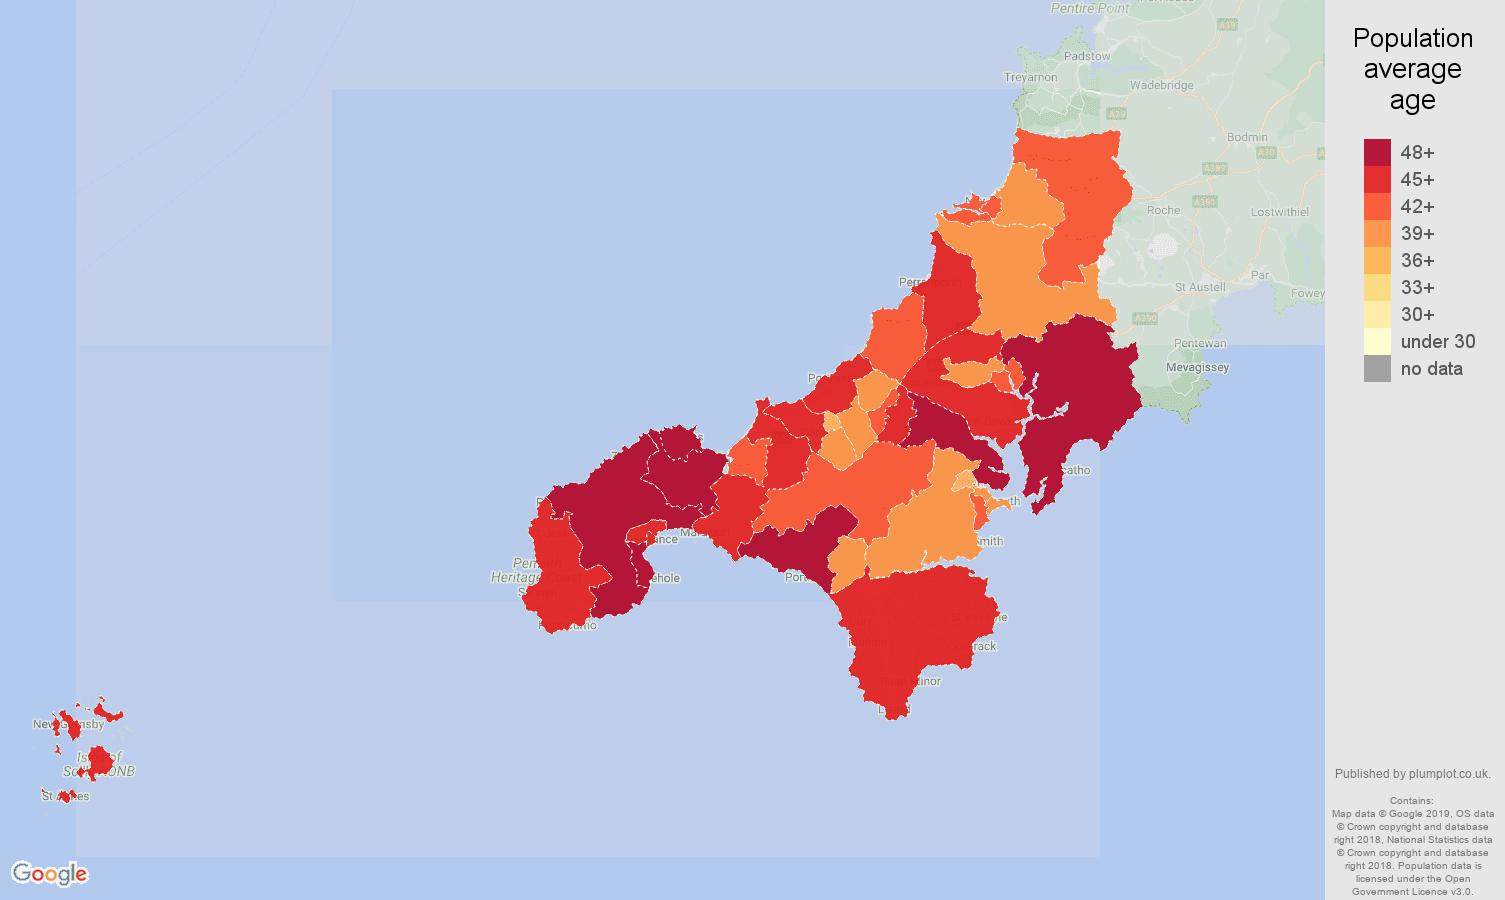 Truro population average age map